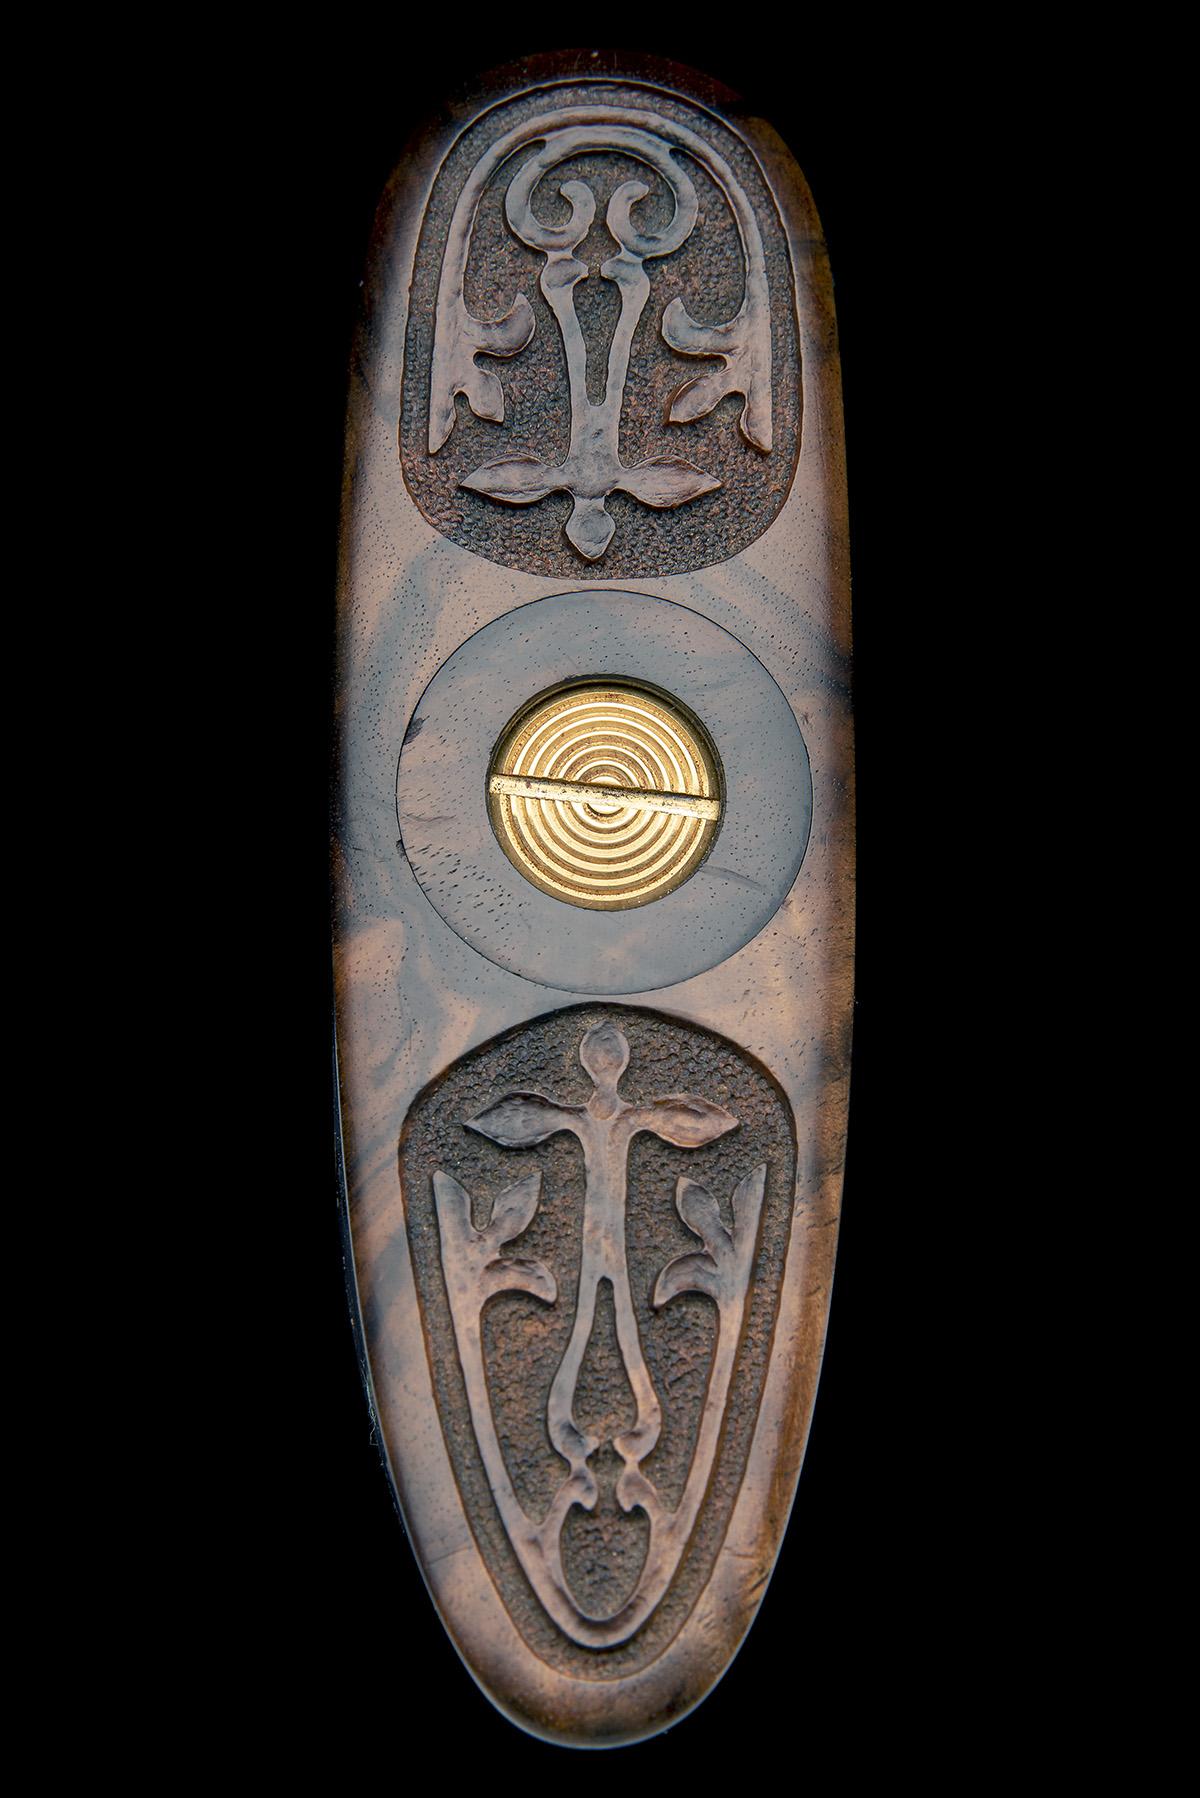 CLAUDE BOUCHET A REMARKABLE PETIOT (MOF)-ENGRAVED .460 WM SINGLE-TRIGGER HAND-DETACHABLE SIDELOCK - Image 17 of 23